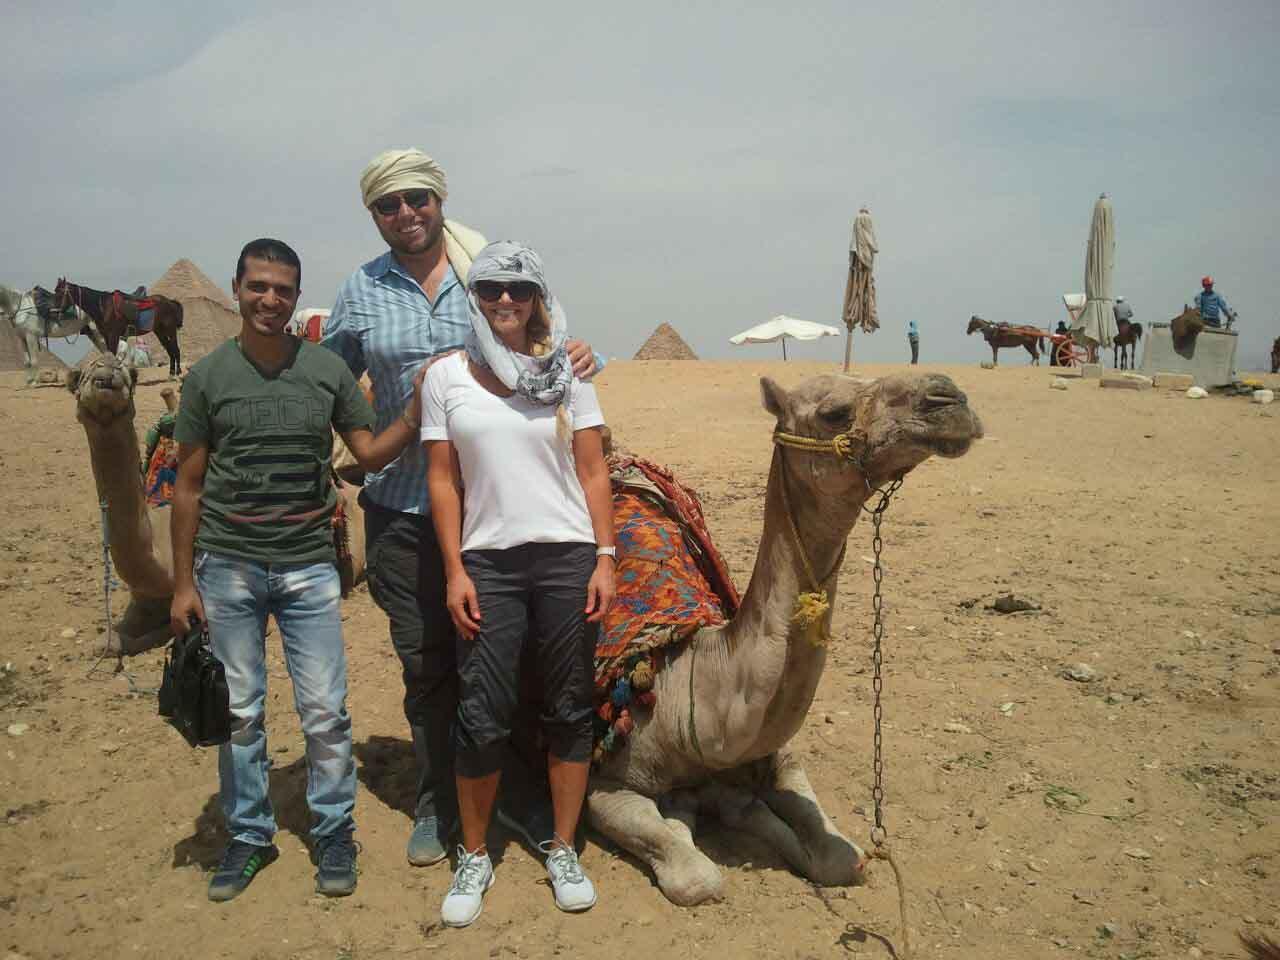 camel ride in giza pyramids